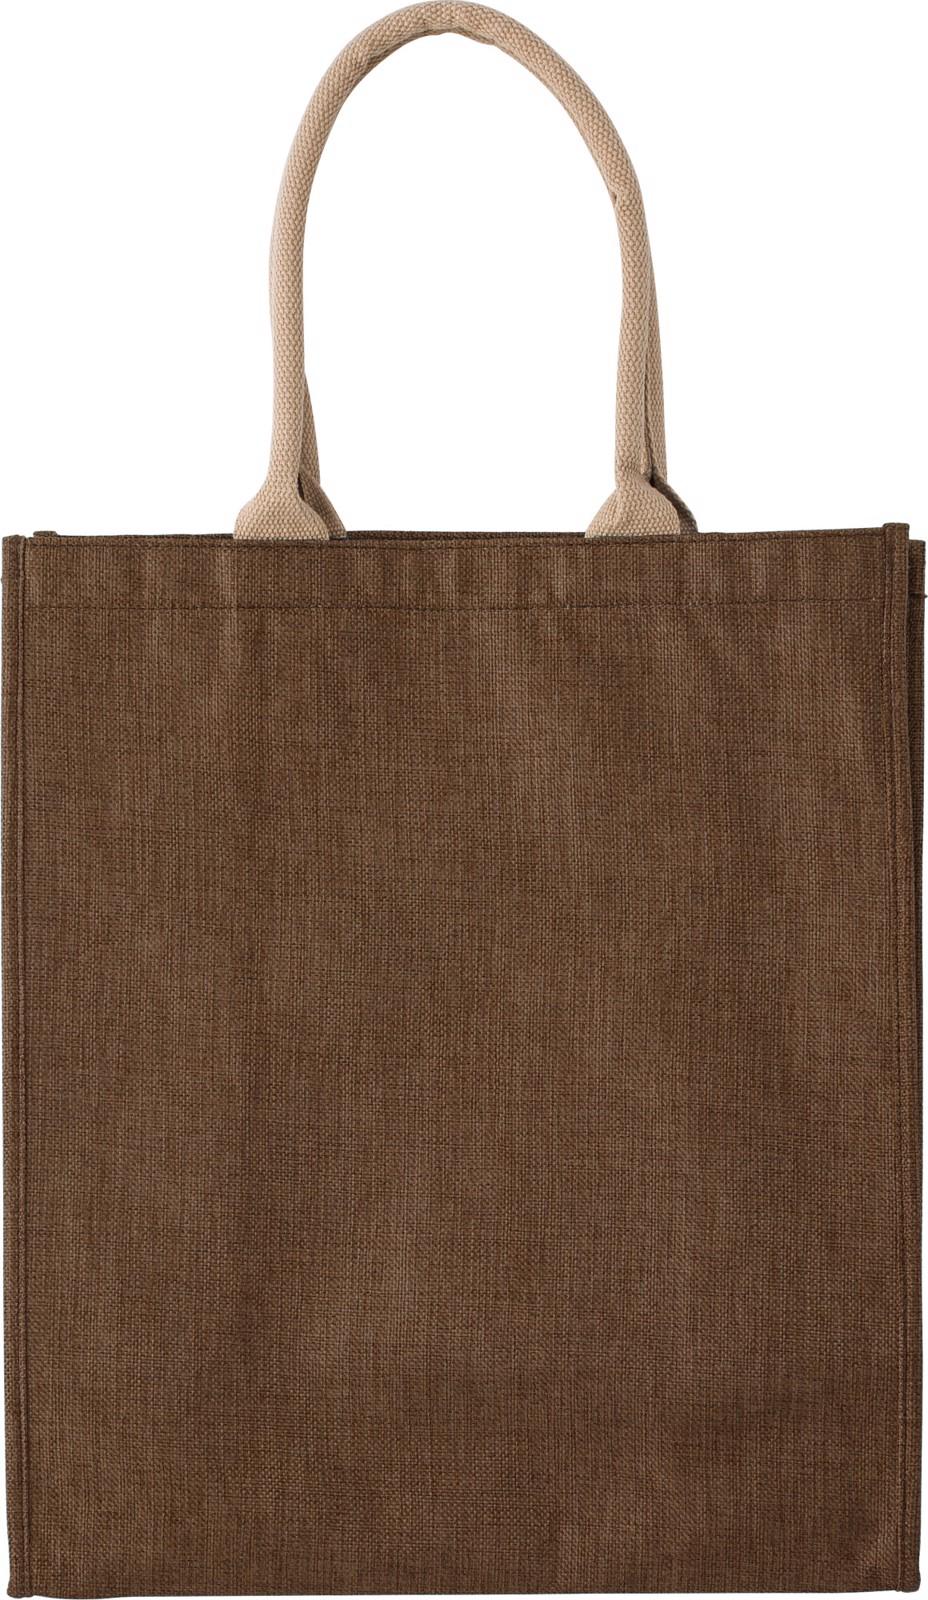 Polyester shopping bag - Brown